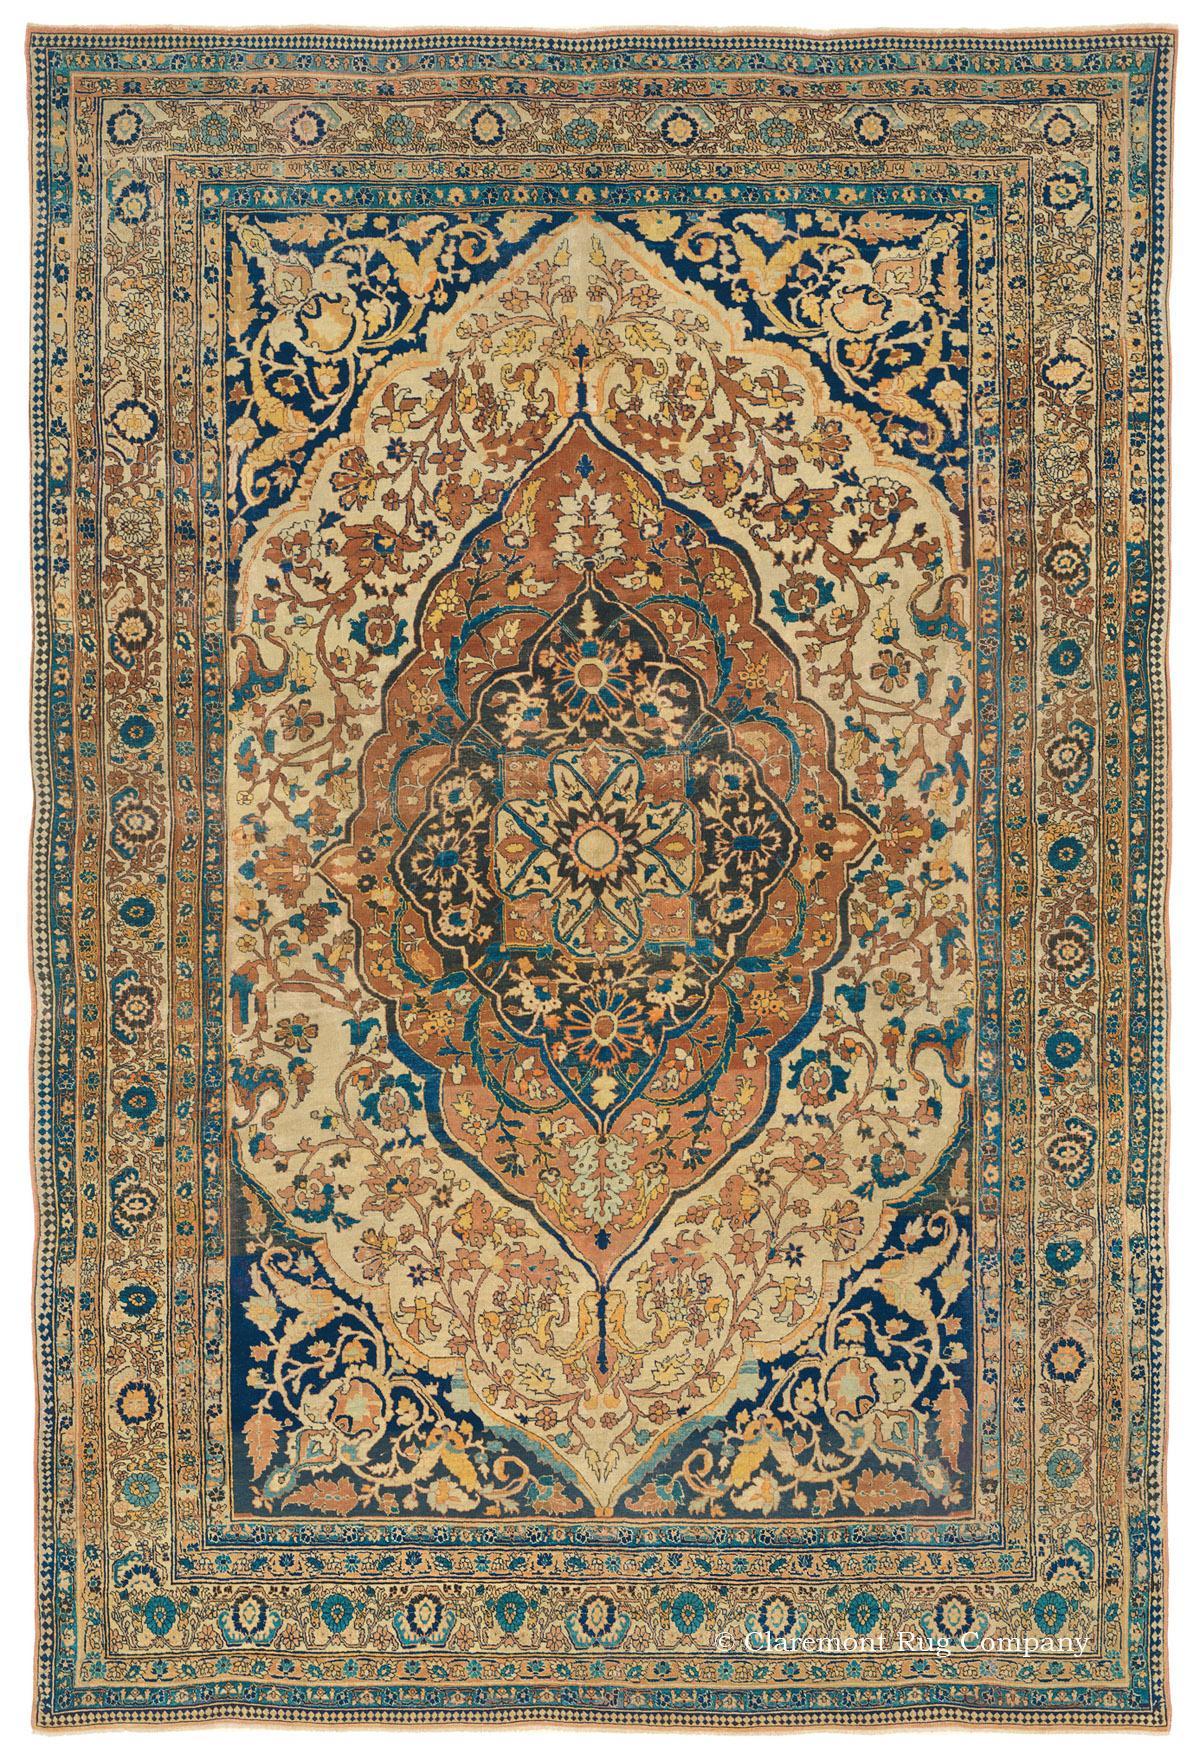 Hadji Jallili Tabriz Northwest Persian Antique Rug